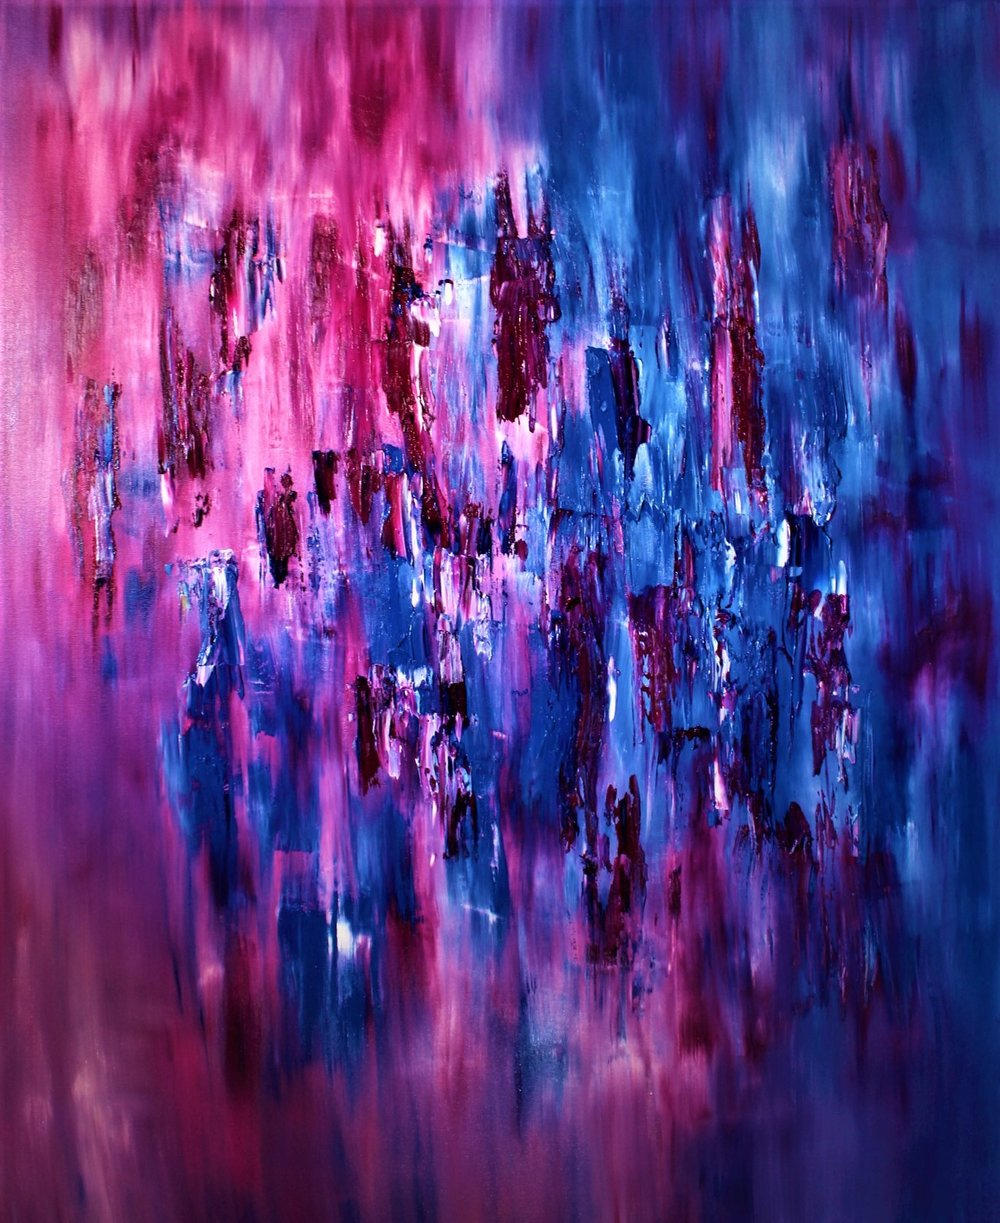 20496930-HannaSupetran_Cosmic Love_Oil On Canvas_60x48_$6650_2019.jpg